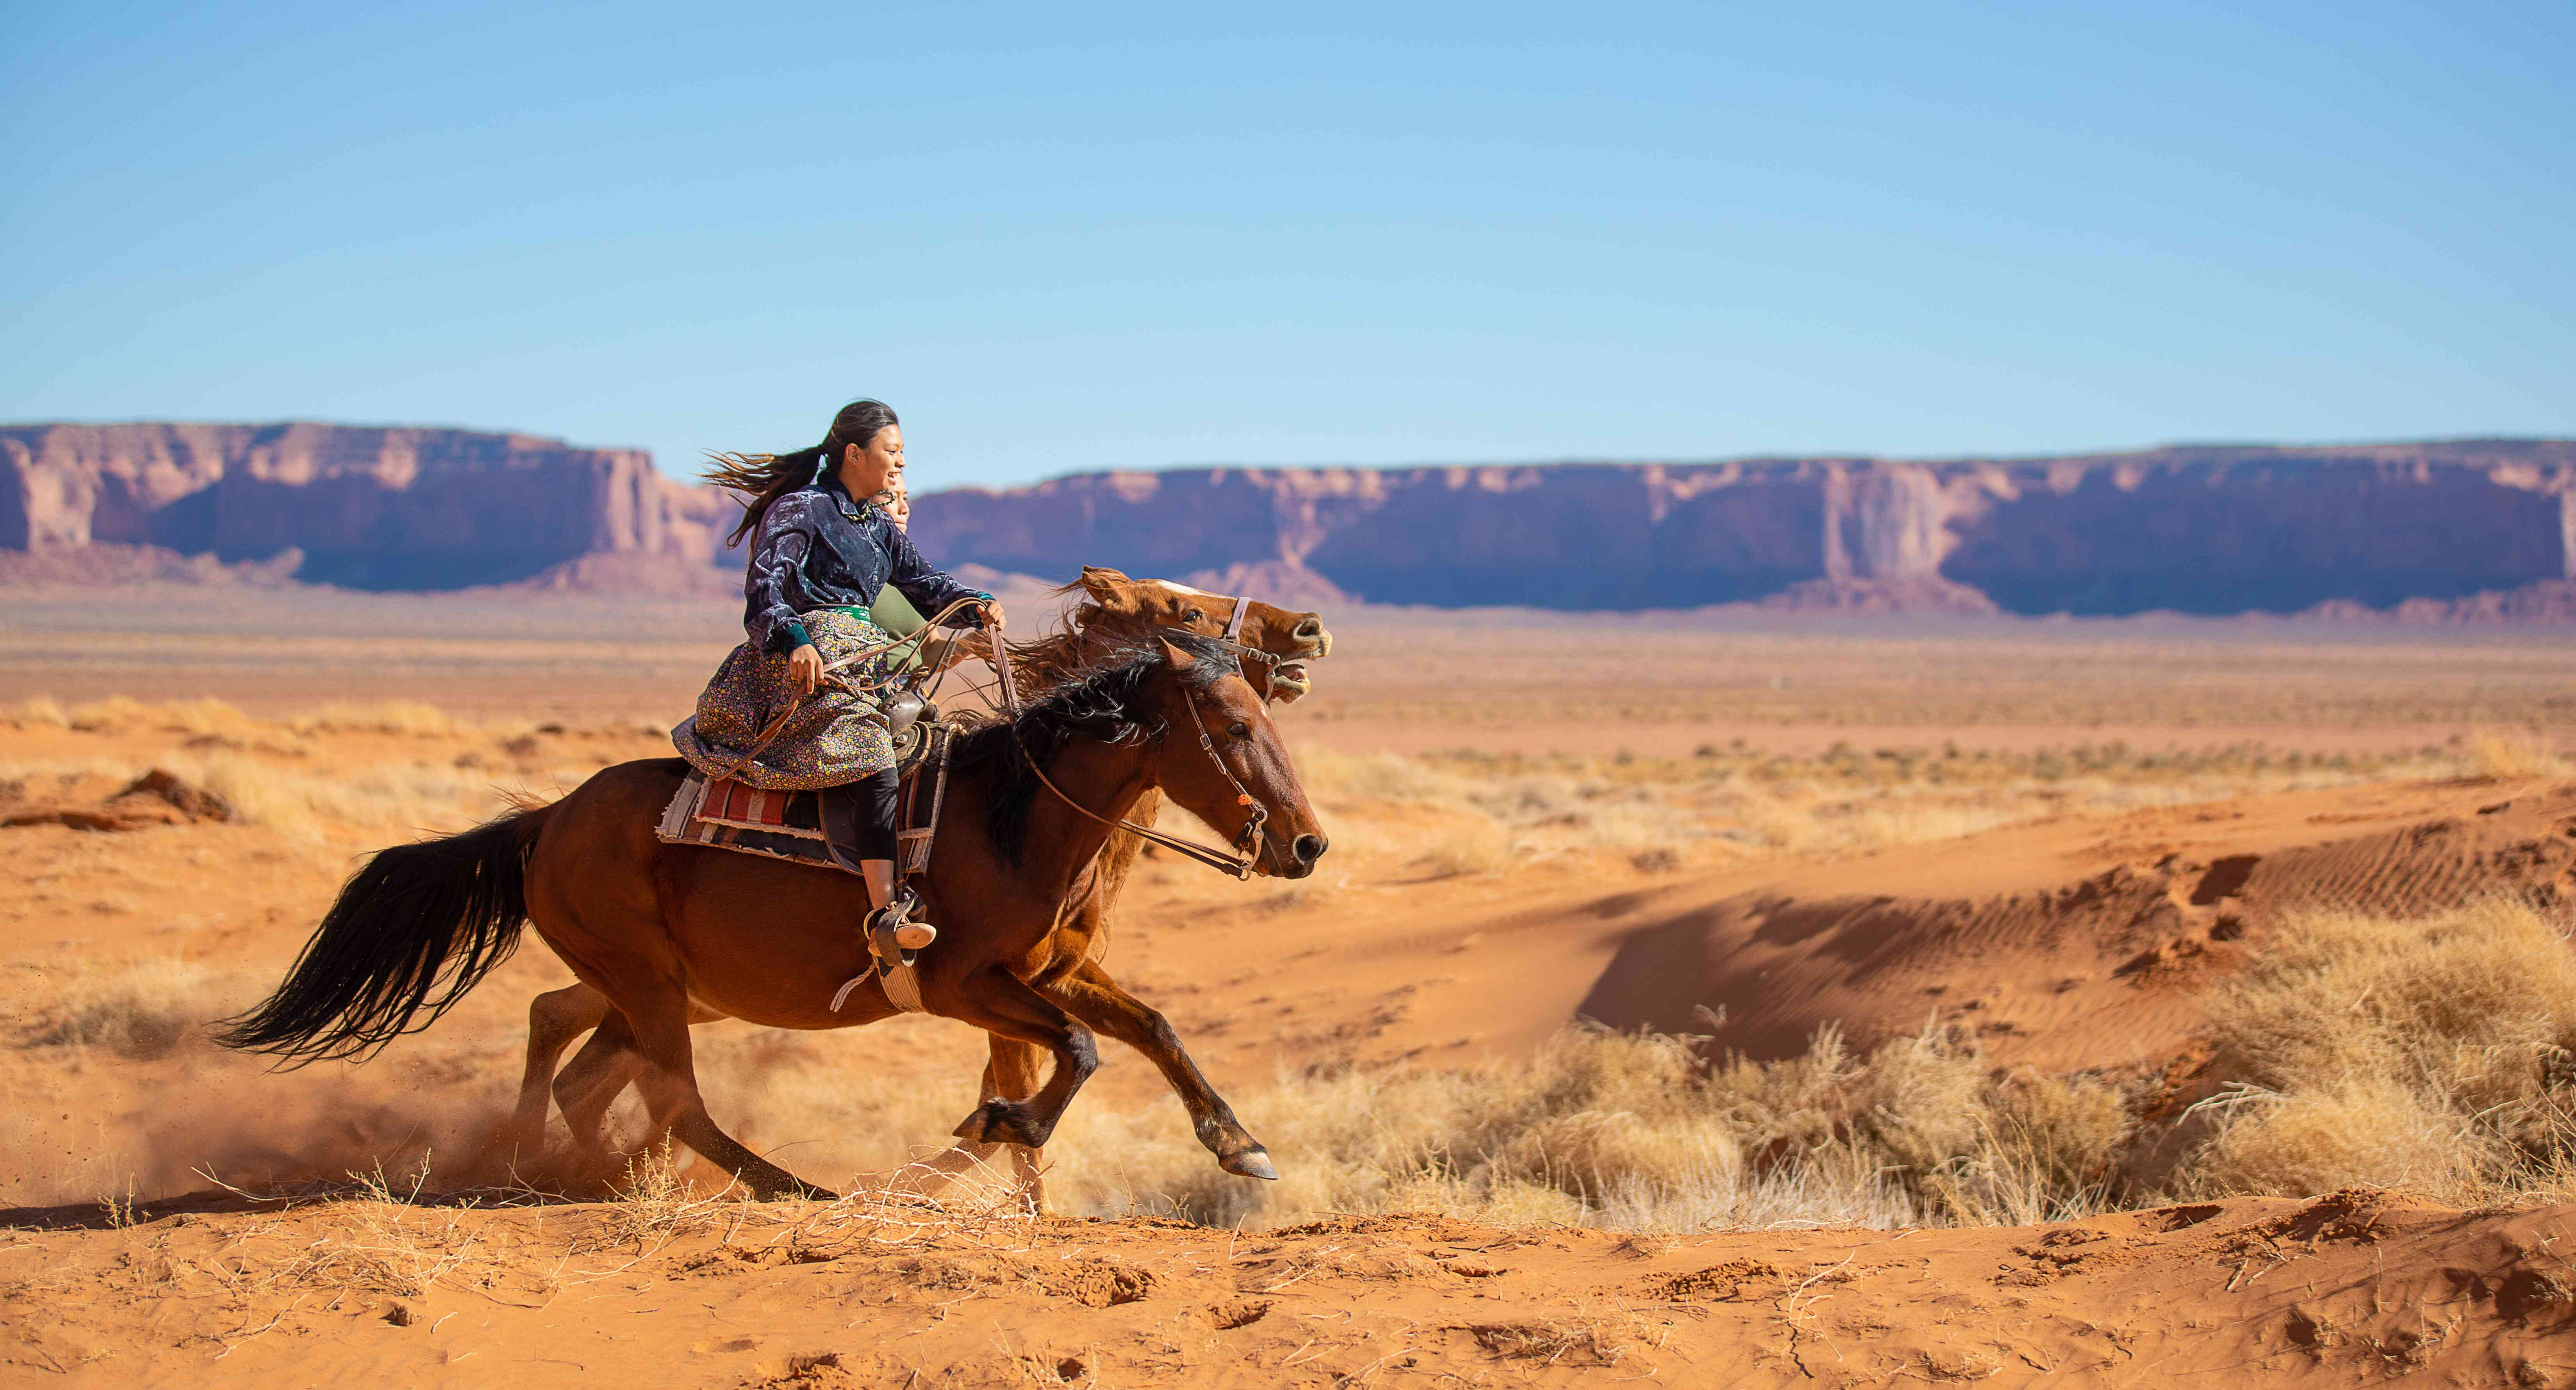 Navajo brothers galloping on horses in Arizona